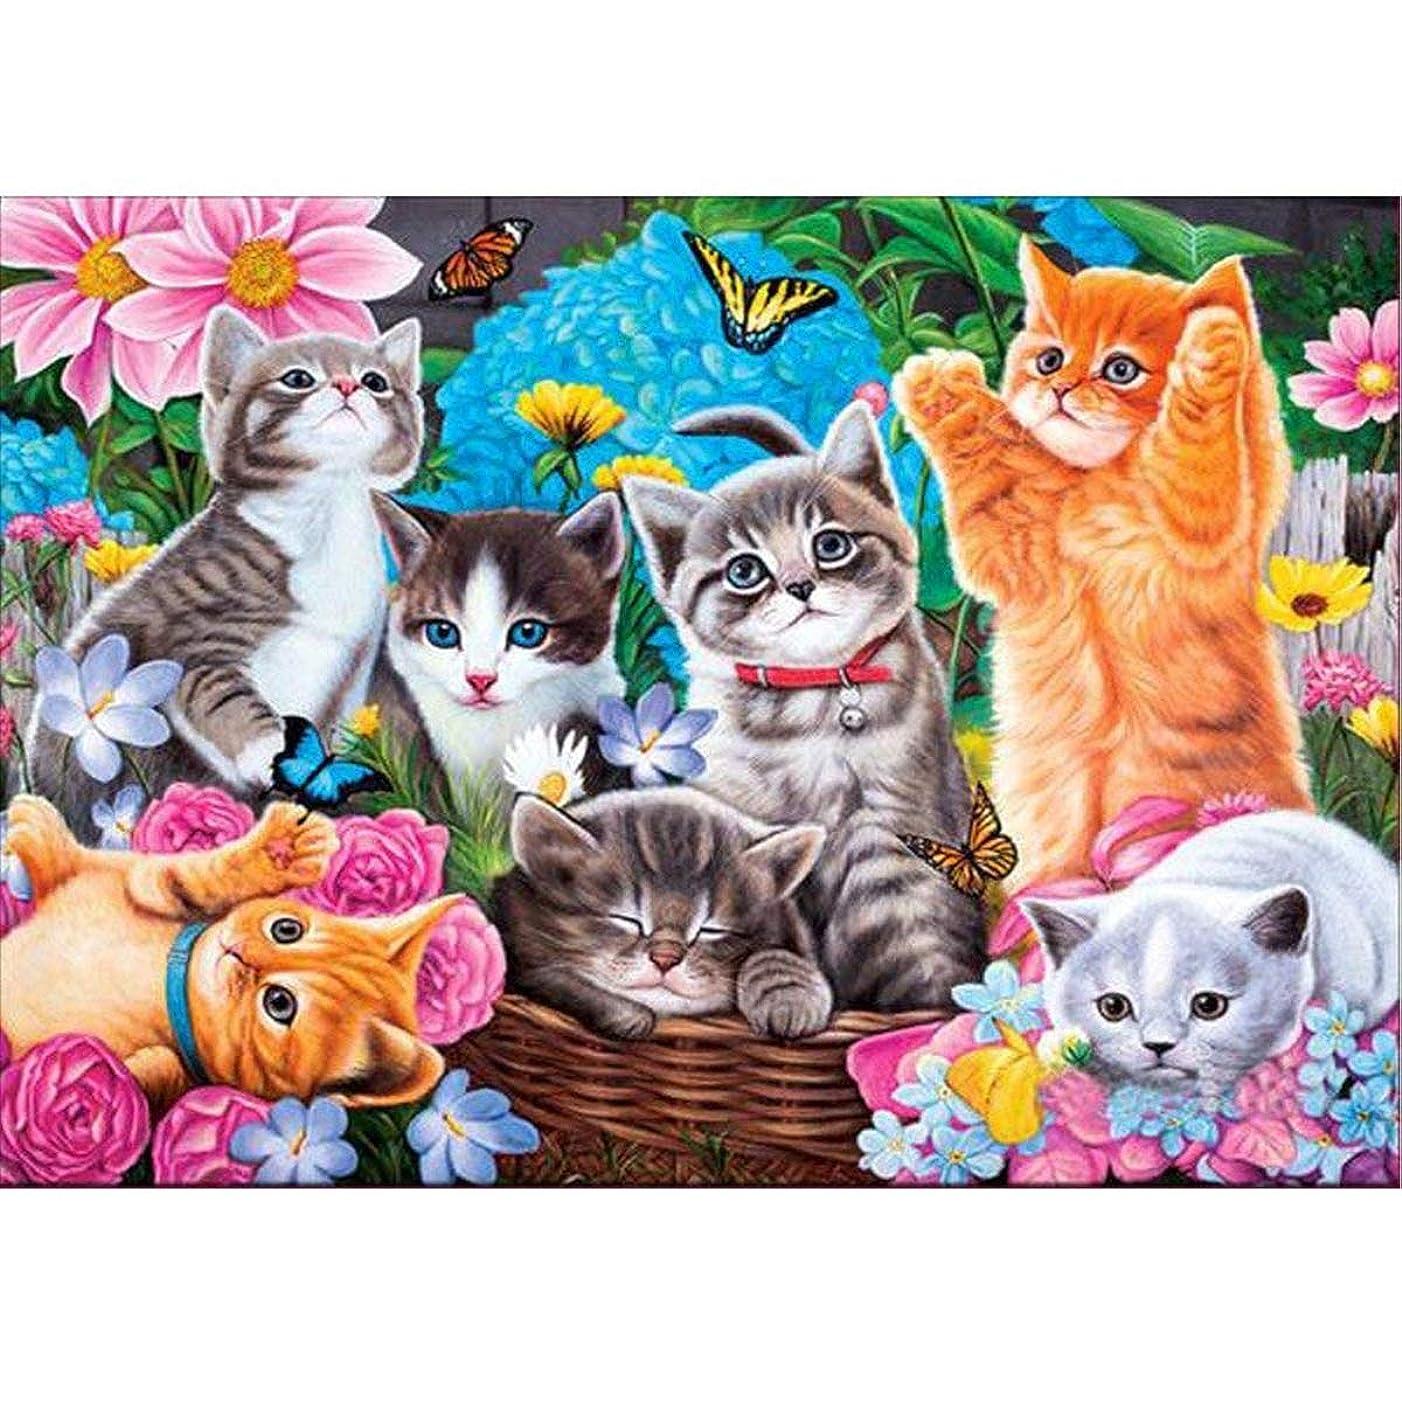 AIRDEA DIY 5D Diamond Painting Kit, Round Diamond Cute Kitten Embroidery Rhinestone Cross Stitch Arts Craft Supply for Home Wall Decor 11.8x15.8 inch